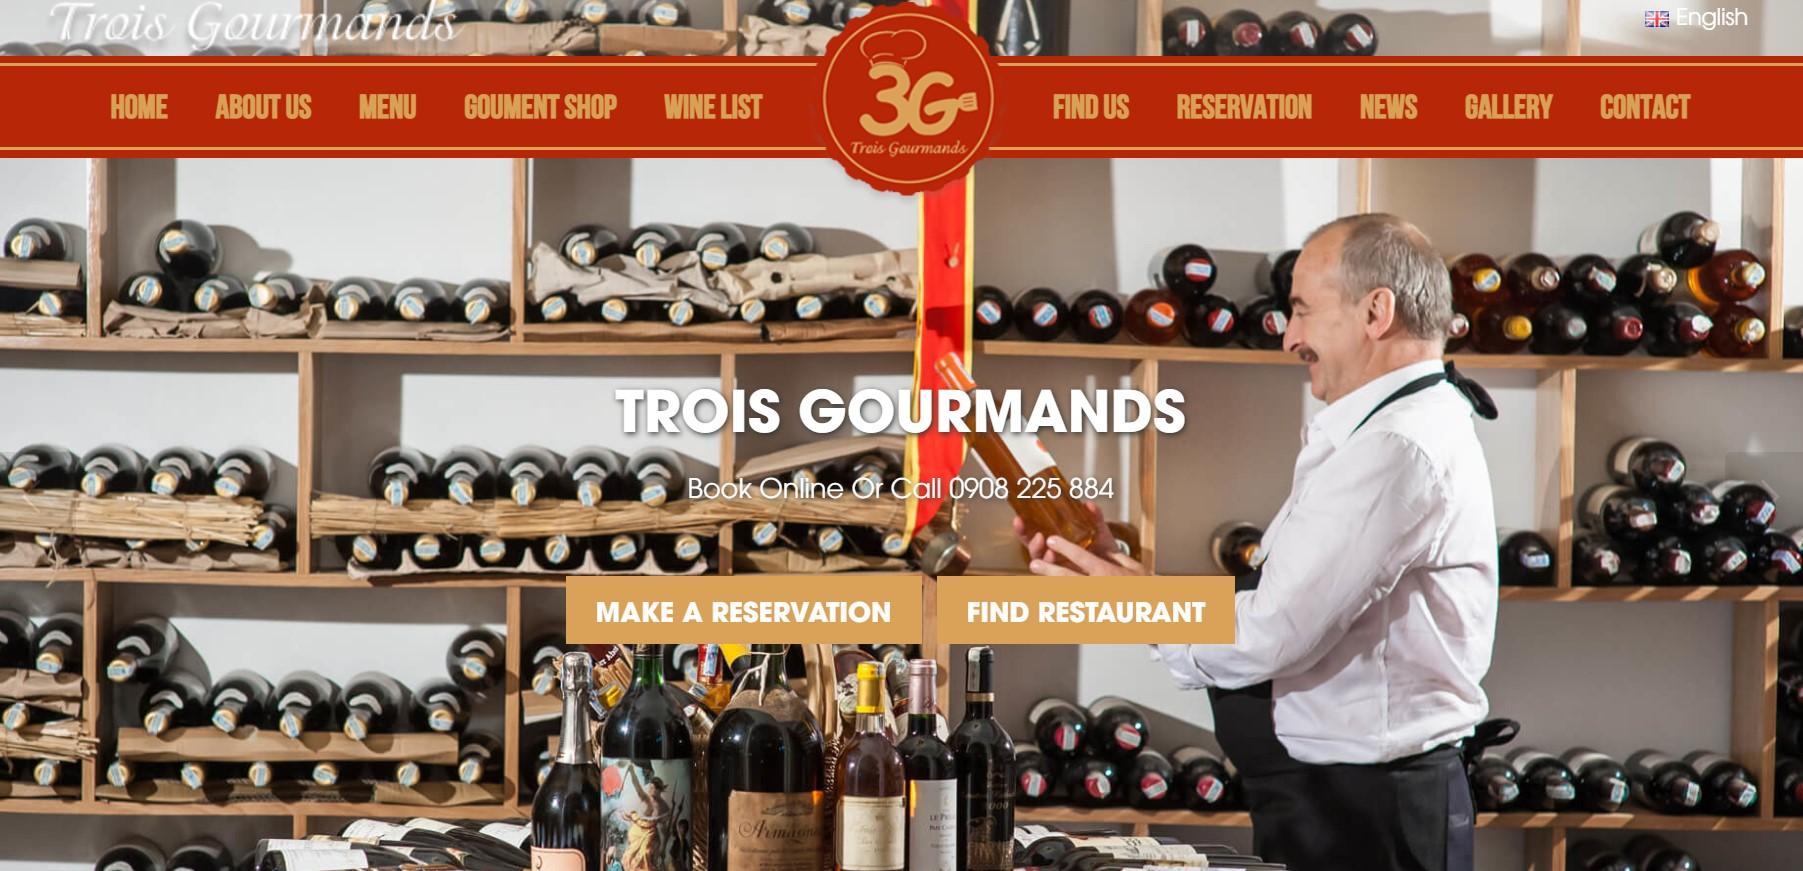 Nhà hàng Trois Gourmands